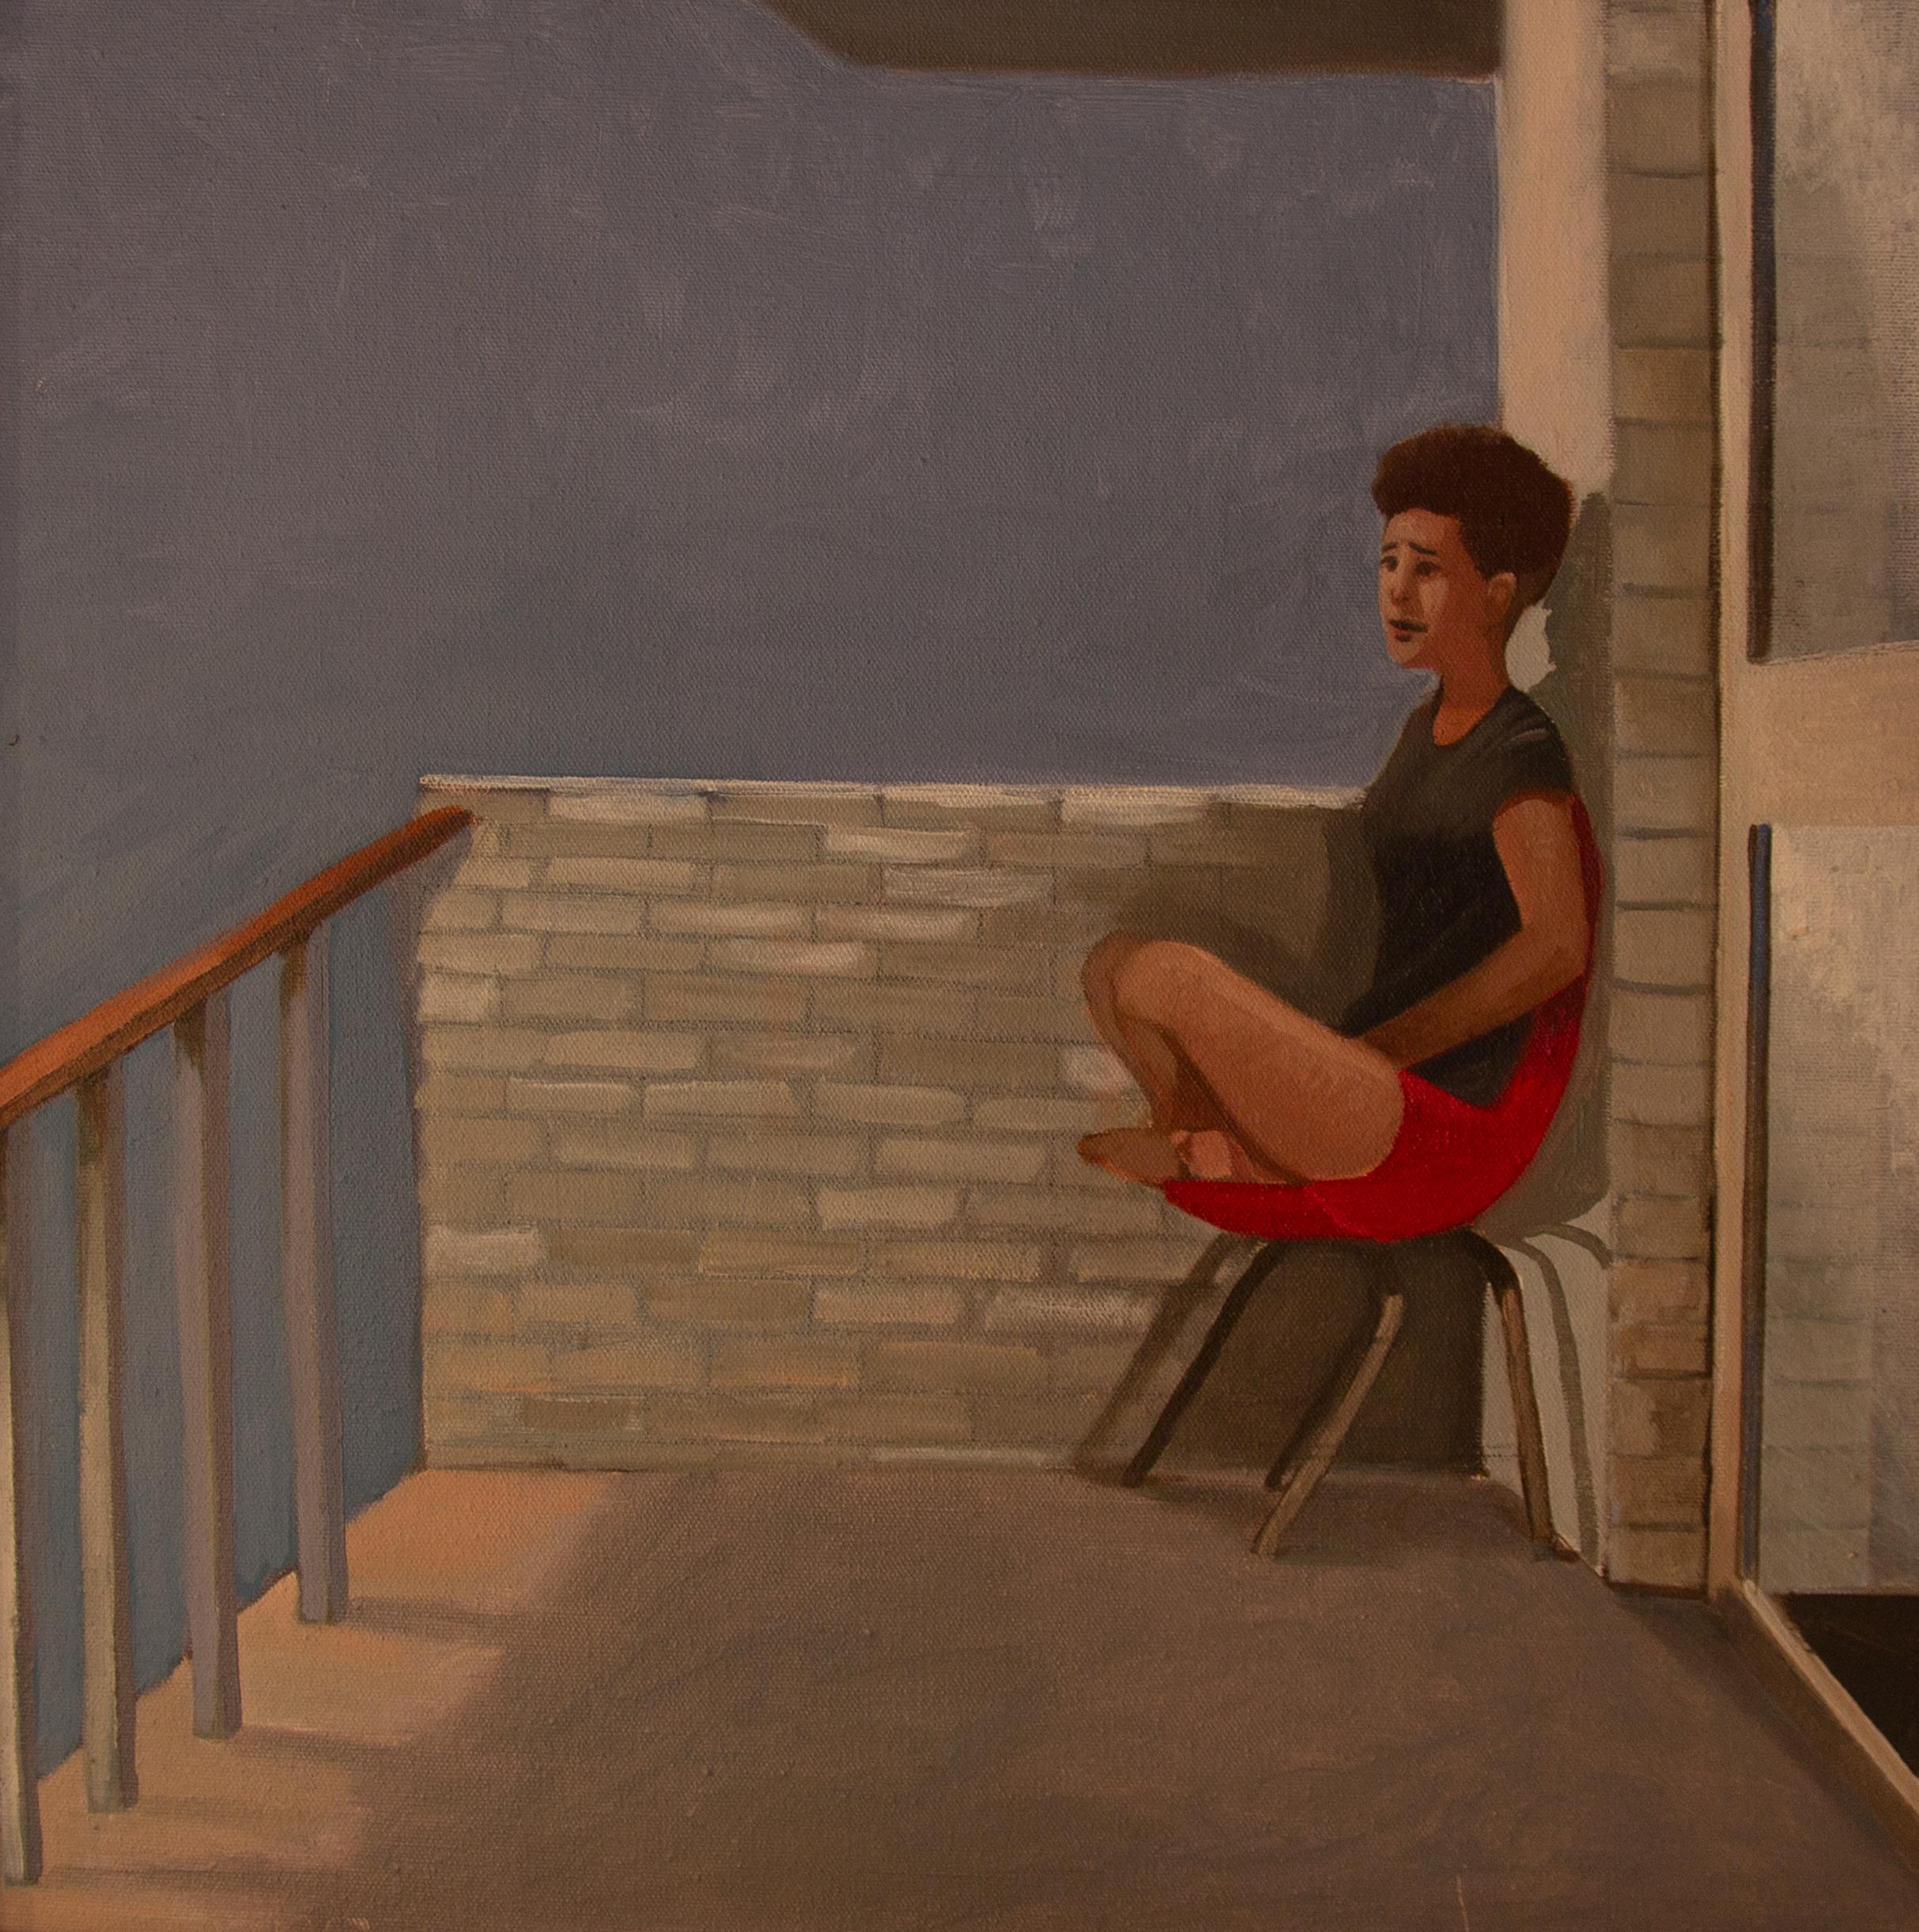 Hernan-Restrepo-Painting-Balcony-01.png